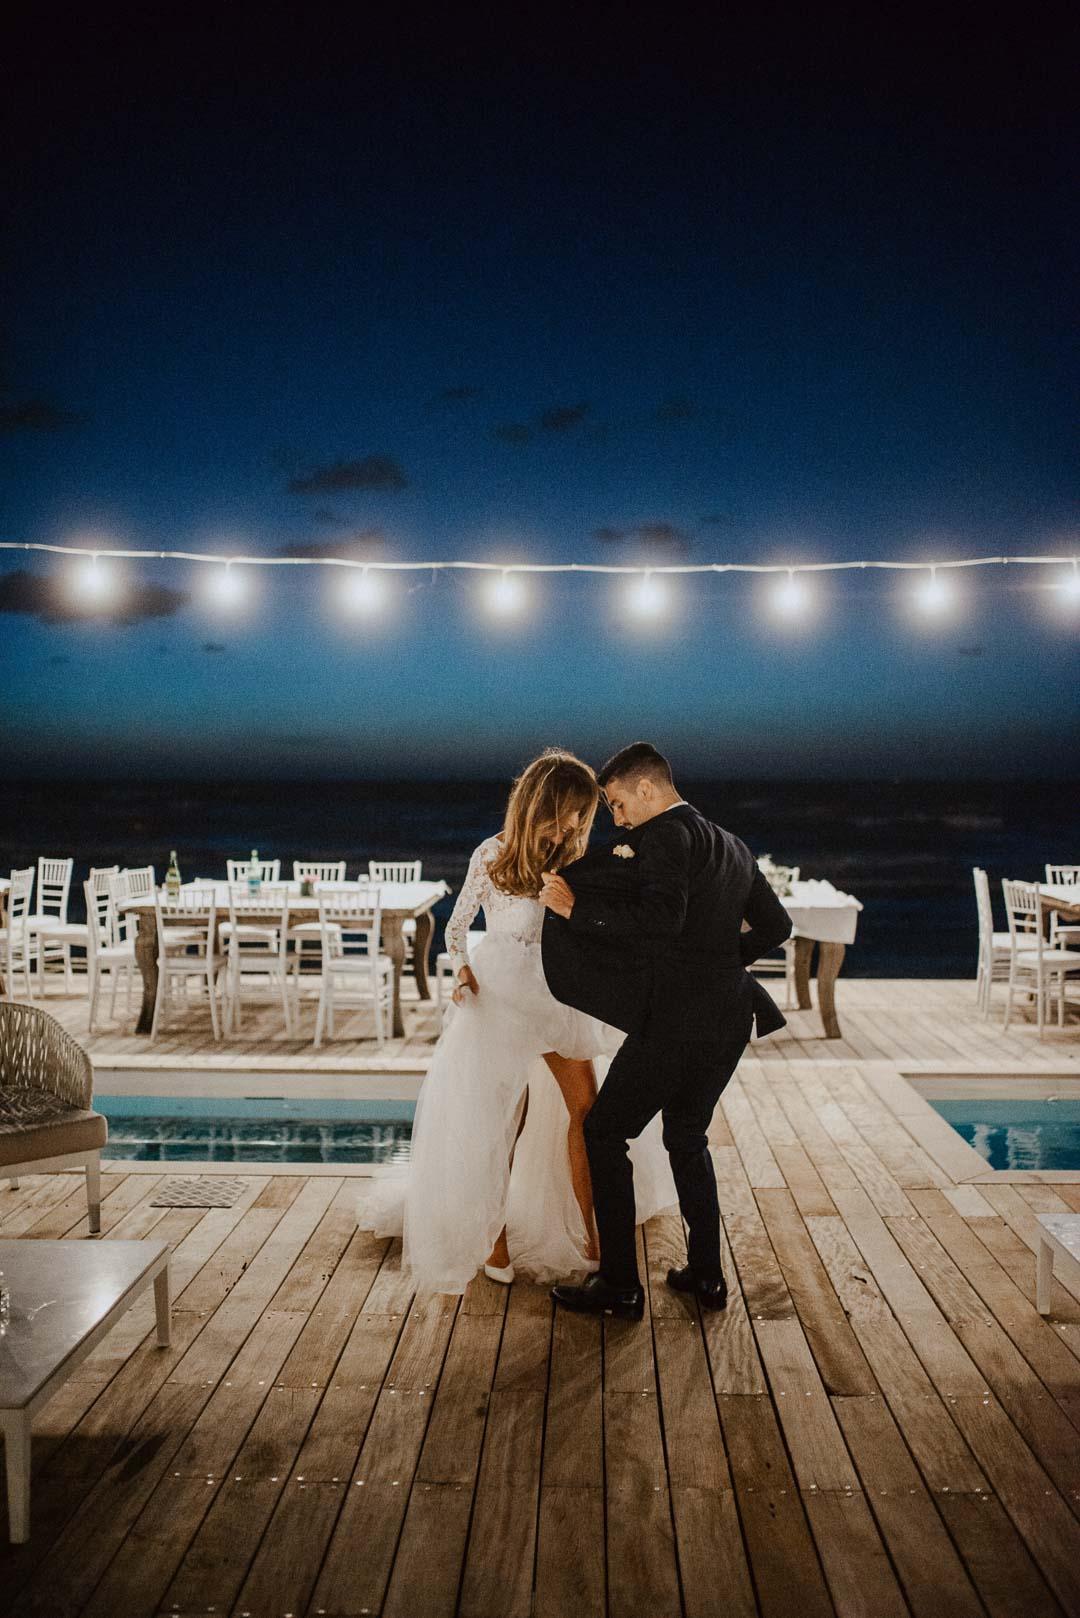 wedding-photographer-destination-fineart-bespoke-reportage-napoli-nabilah-vivianeizzo-spazio46-165